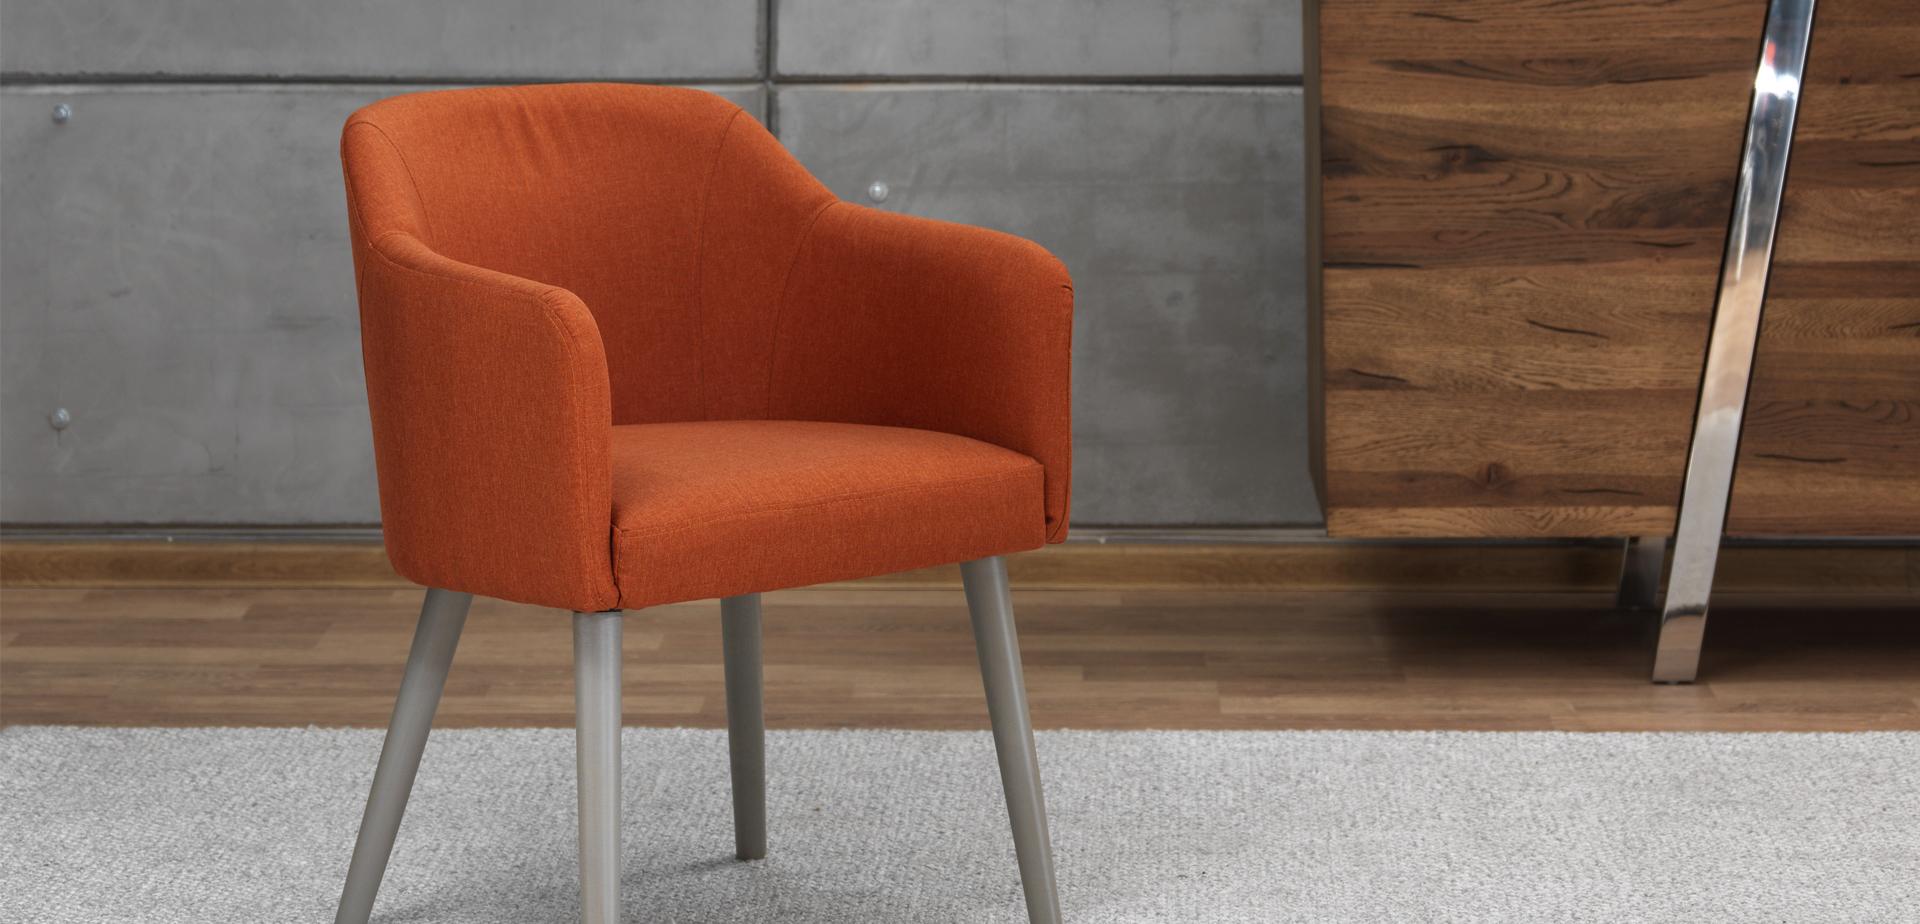 sofia-scaun-11.jpg